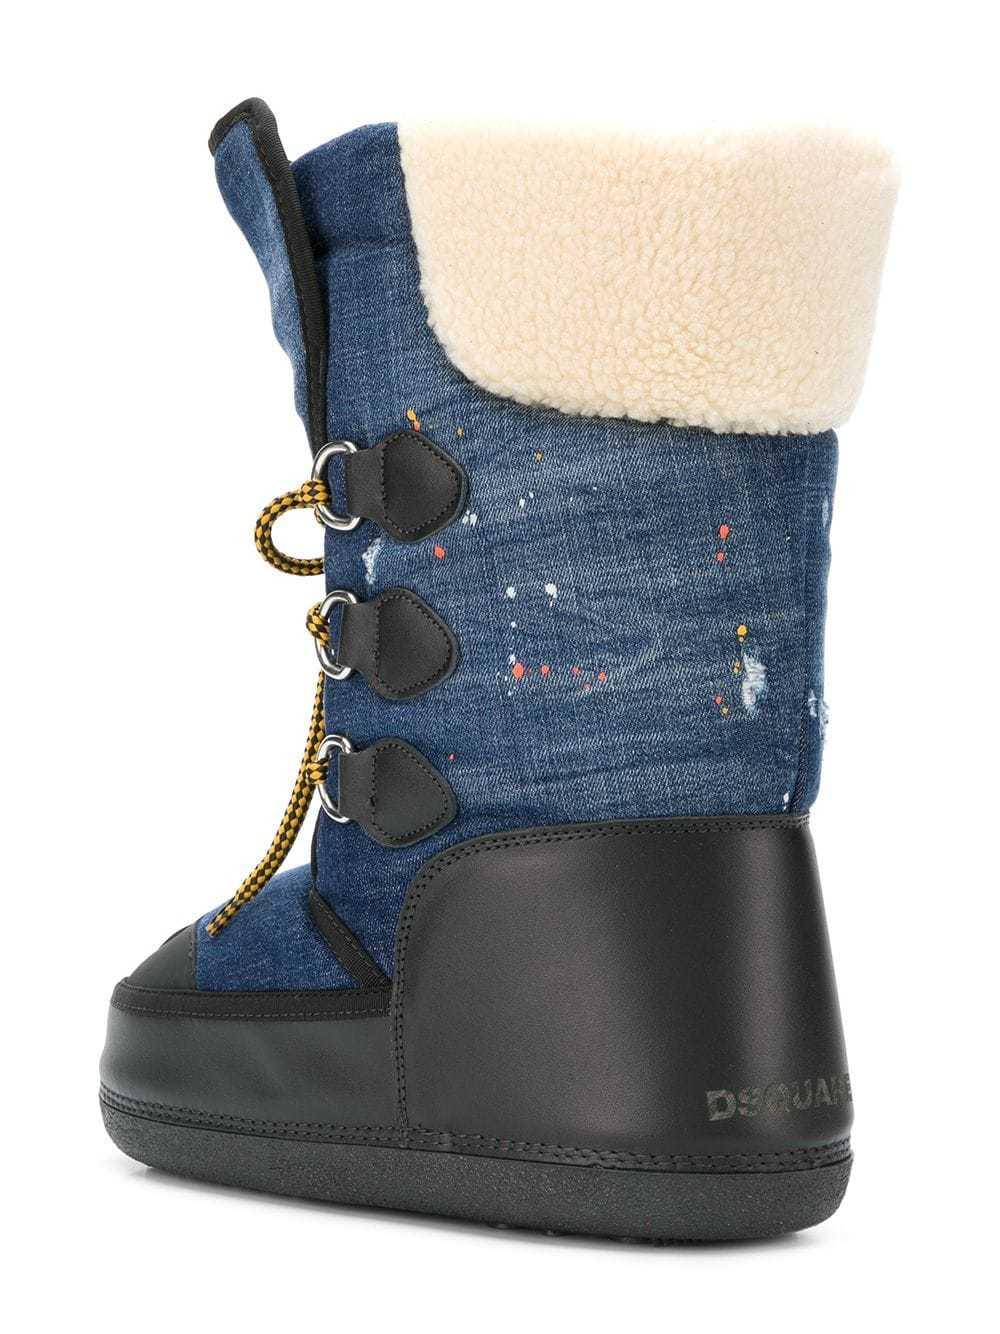 Botas para la Nieve Azul Marino de DSQUARED2